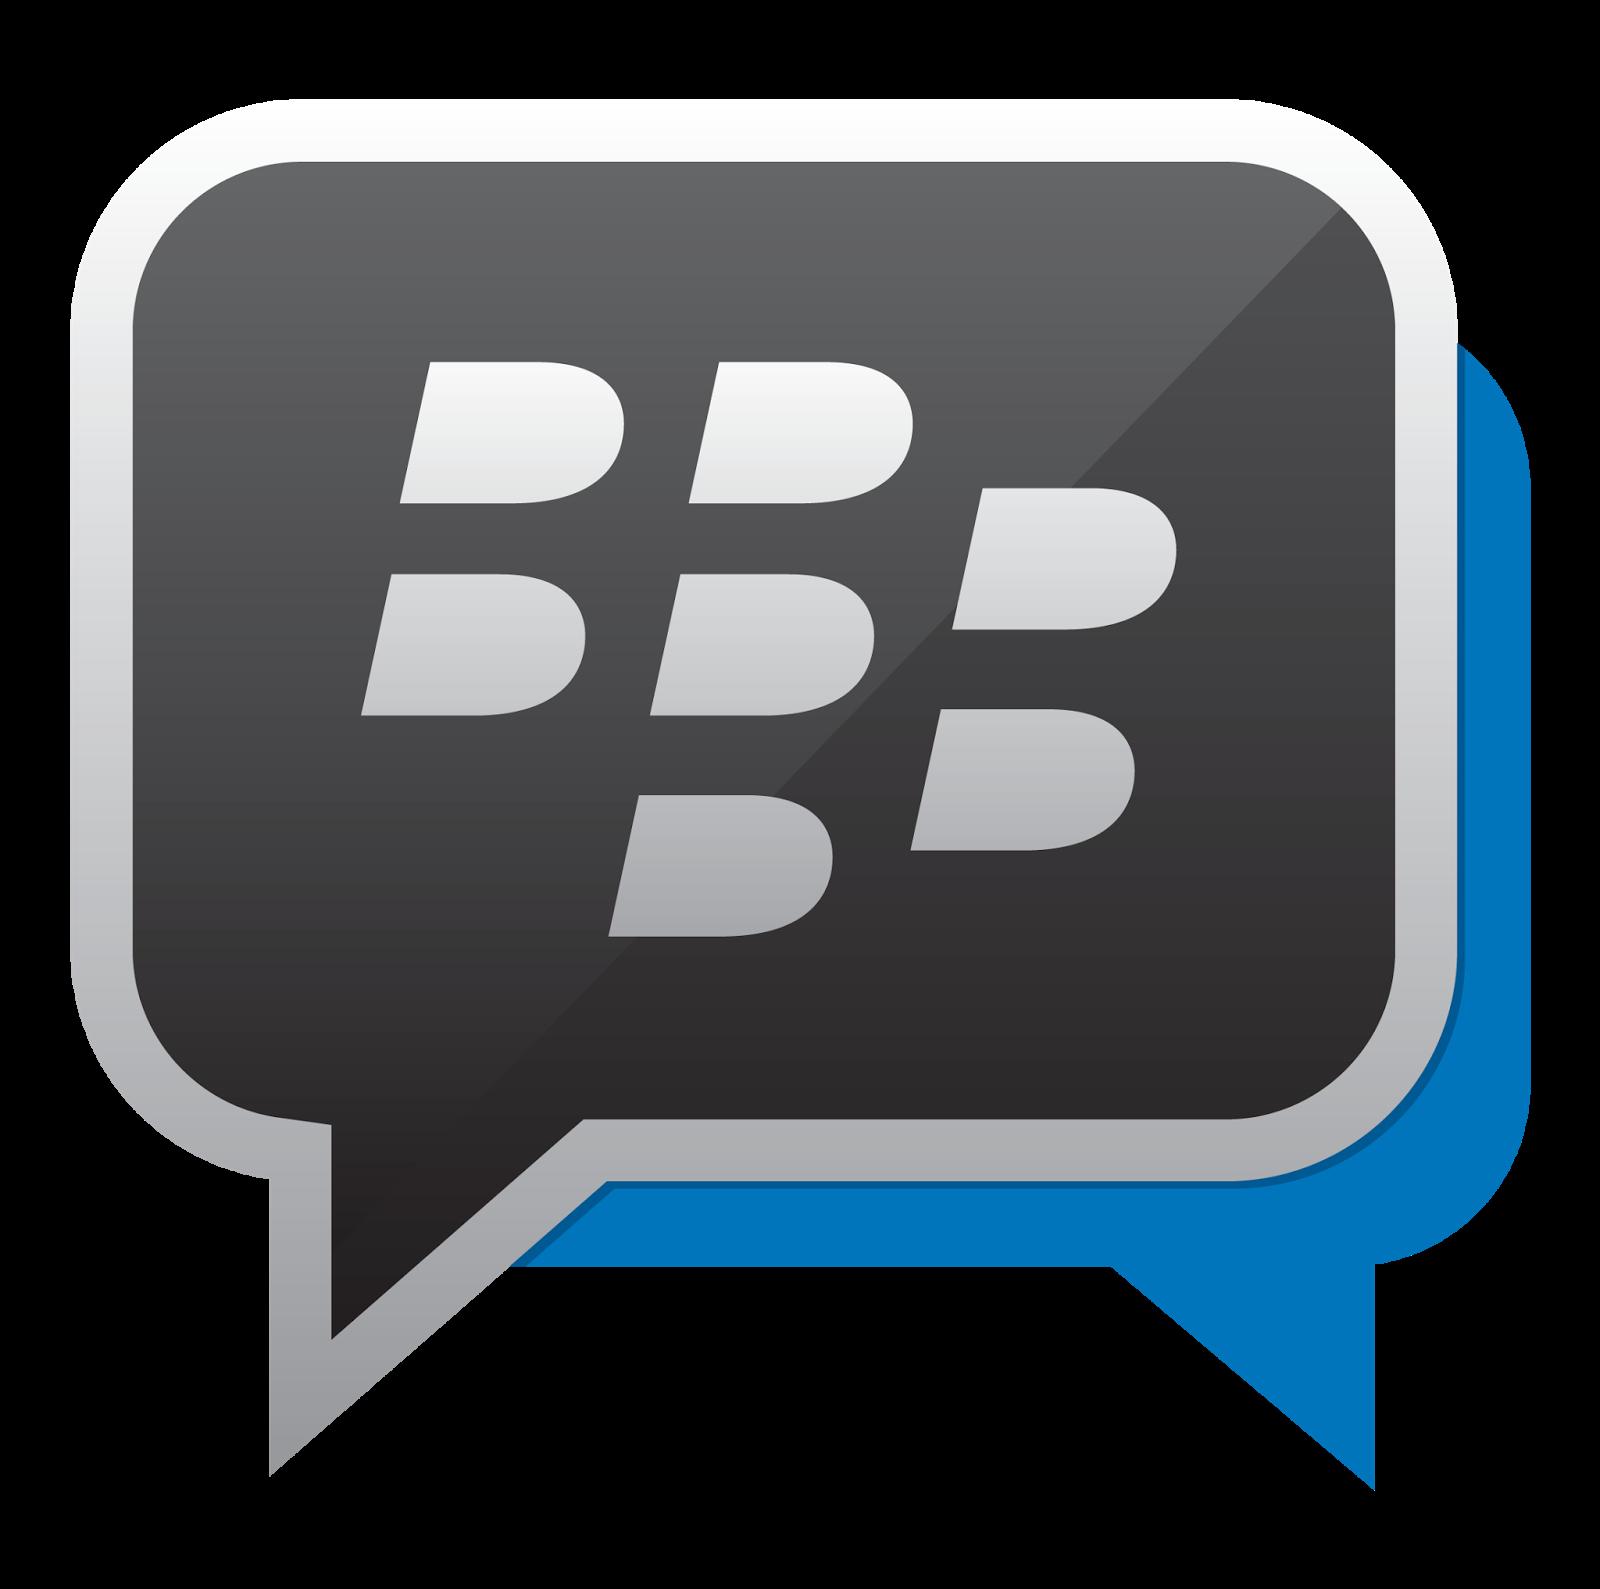 Messenger Logo Wallpaper